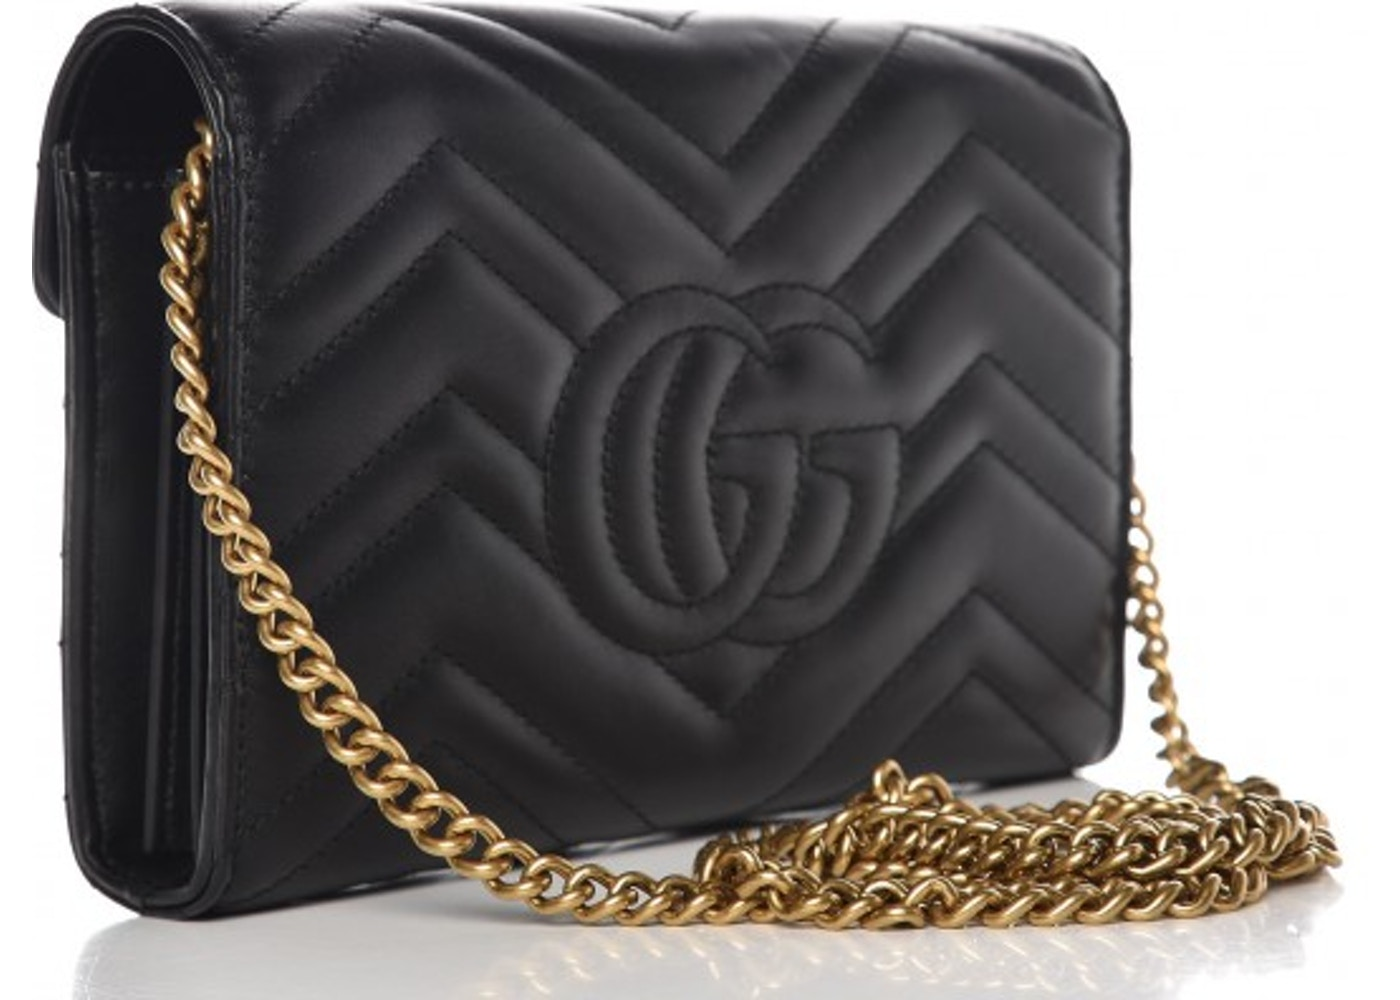 b5d8c758a Gucci Marmont Wallet on Chain Matelasse Black